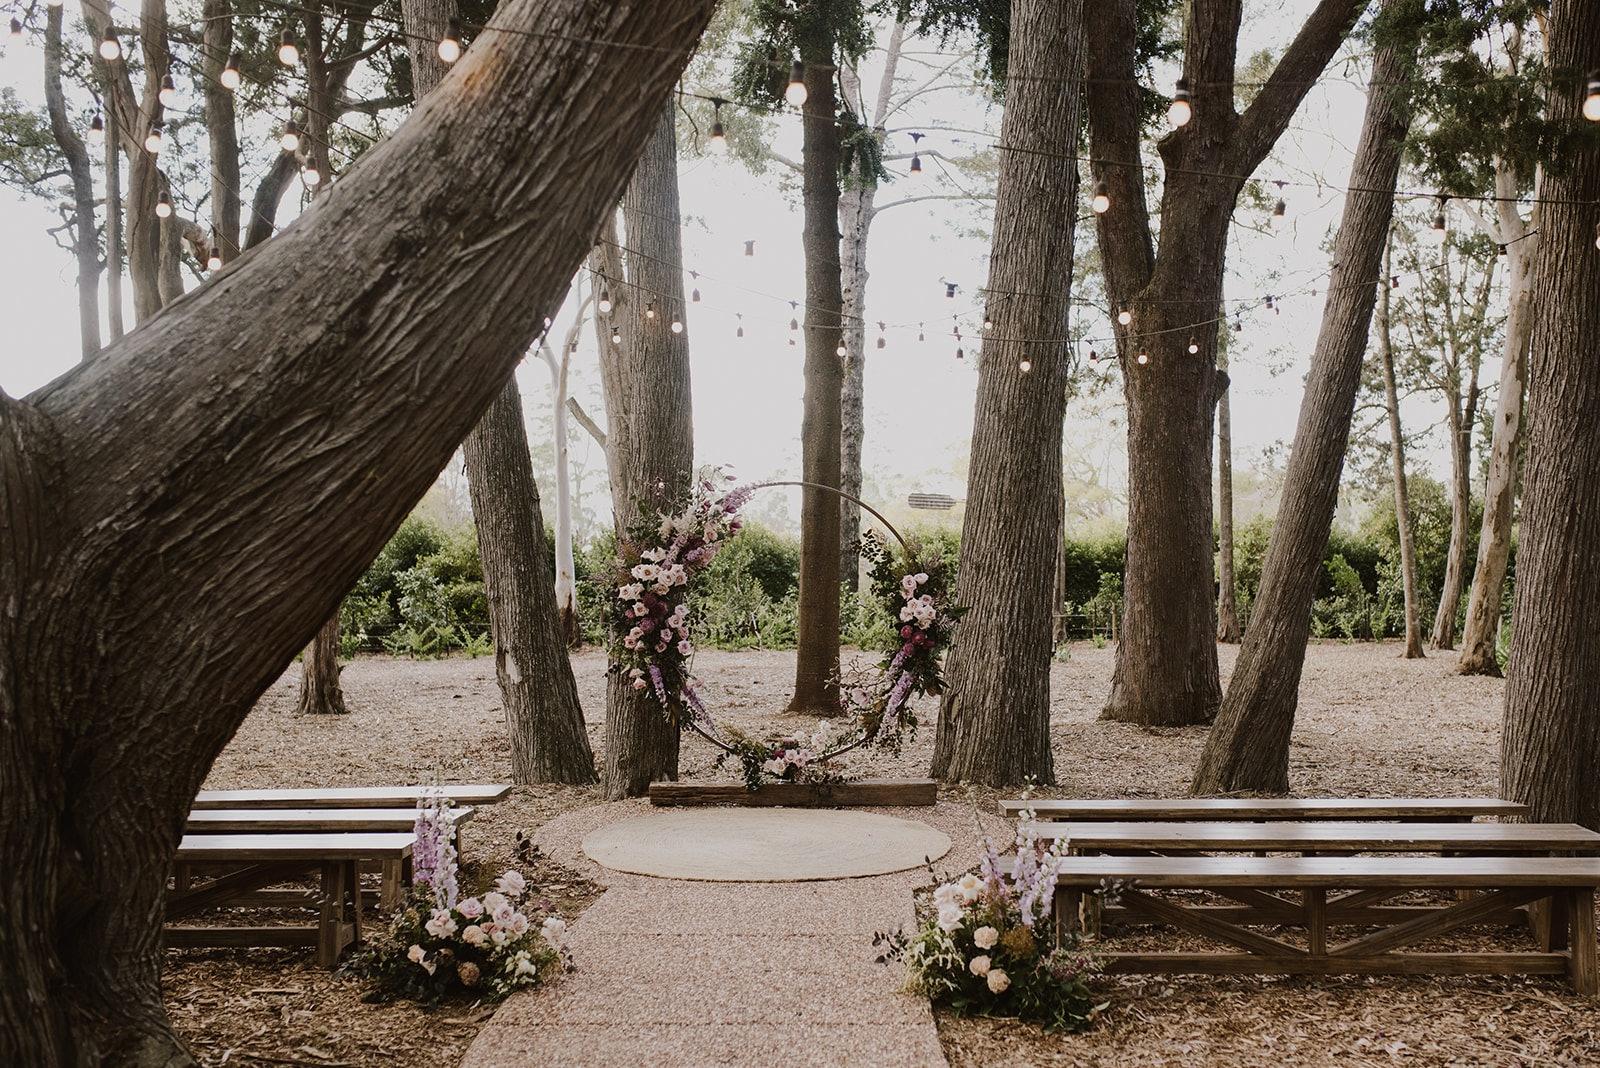 Floral circular arbor in woodland setting